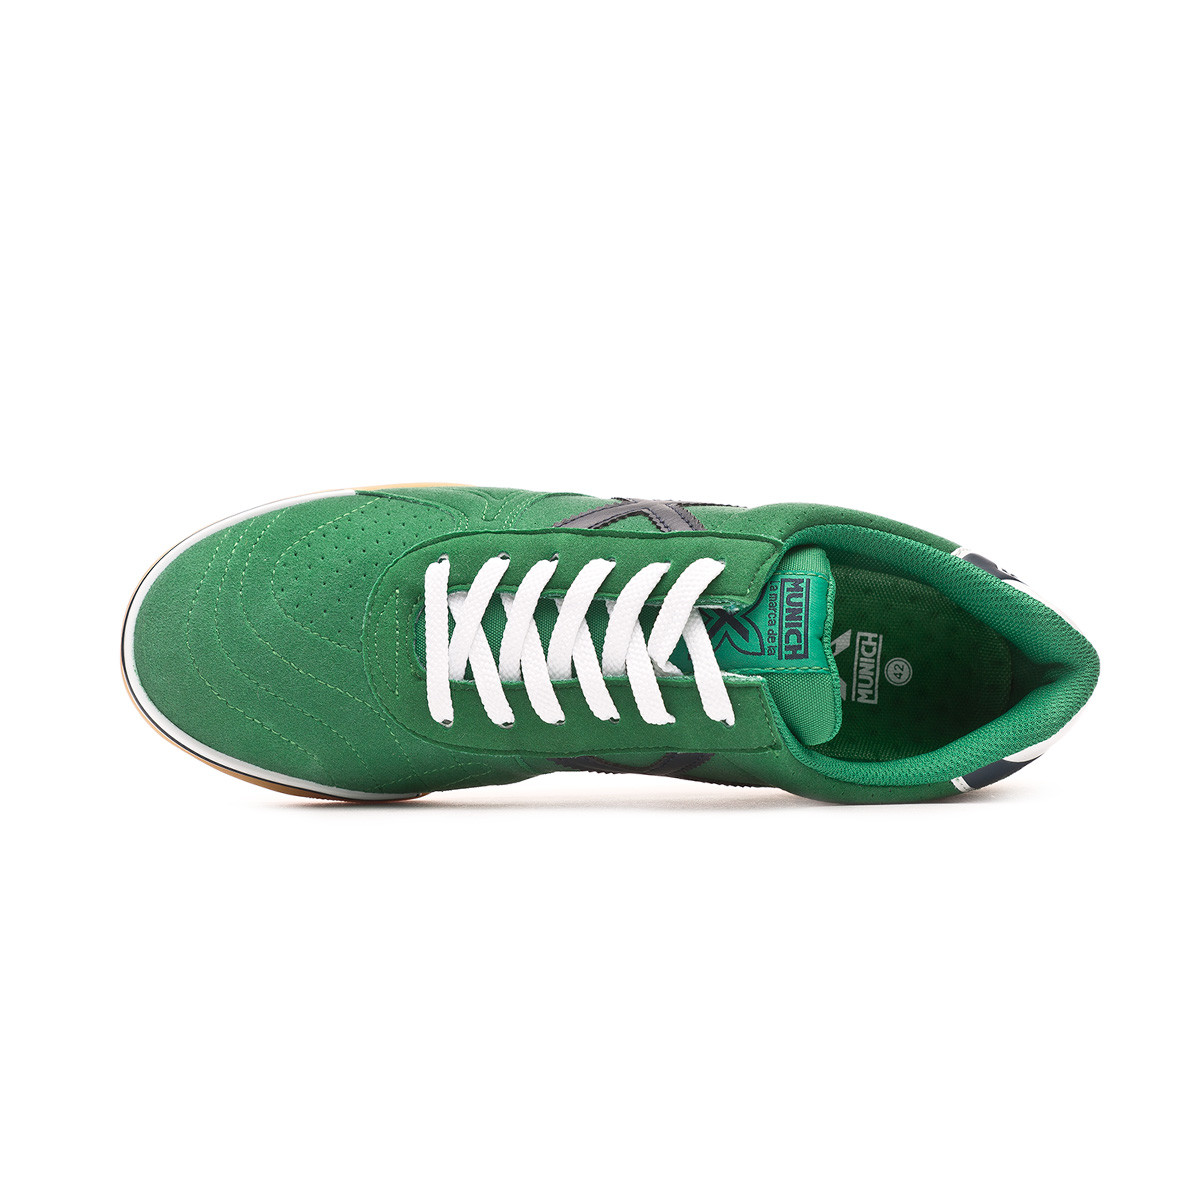 655a29e5e9c Futsal Boot Munich G3 Profit Green-Black - Nike Mercurial Superfly | Shop  Nike Soccer Cleats ypsoccer.com